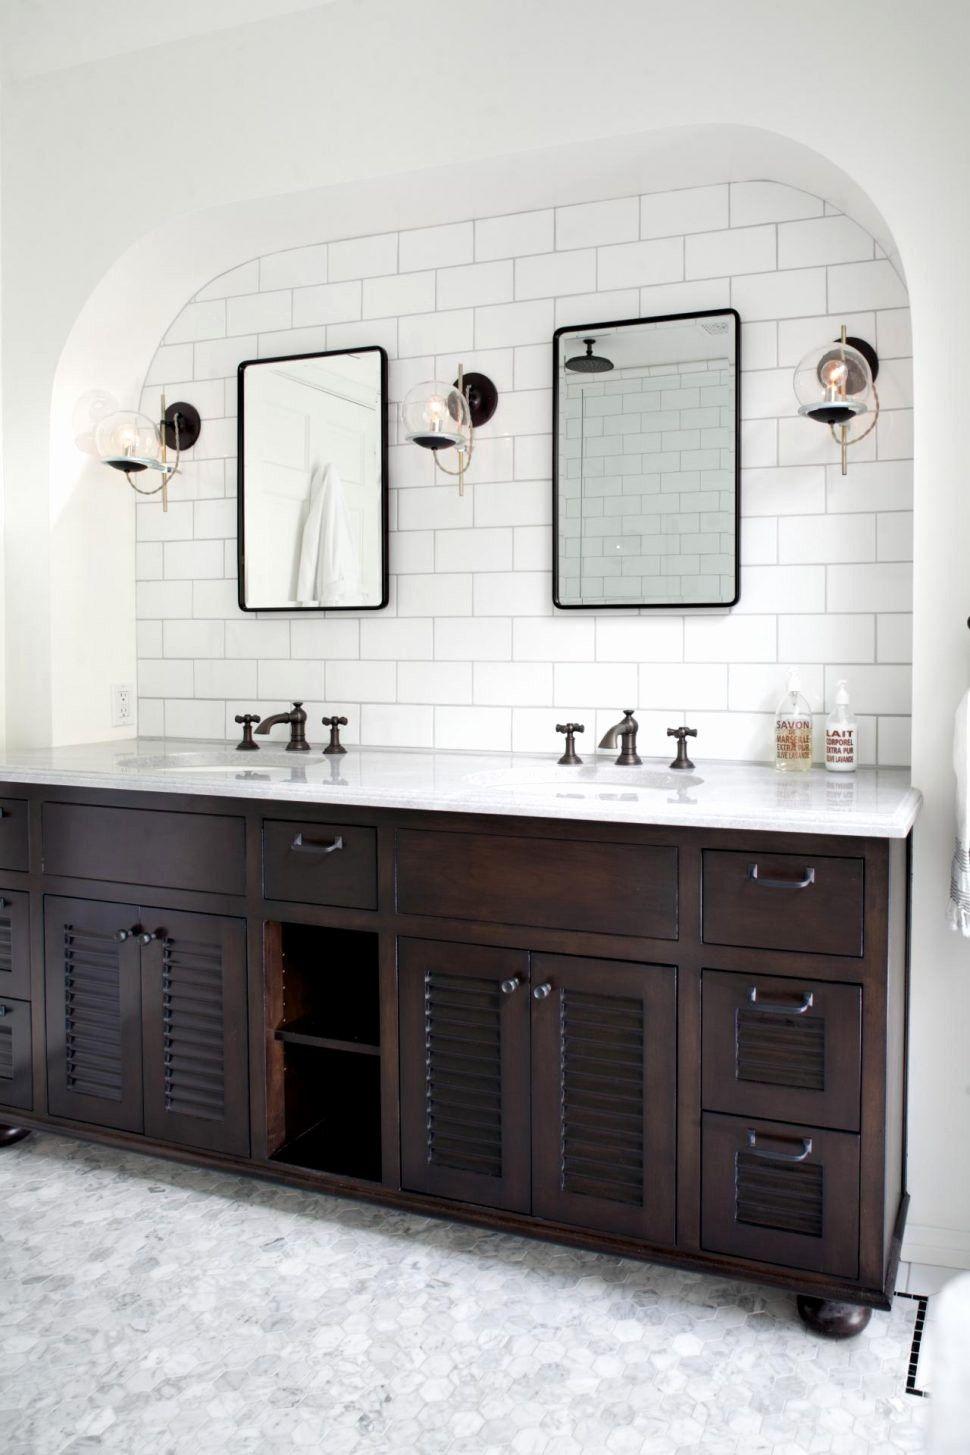 2019 Bathroom Cabinets Builders Warehouse - Small Kitchen island ...